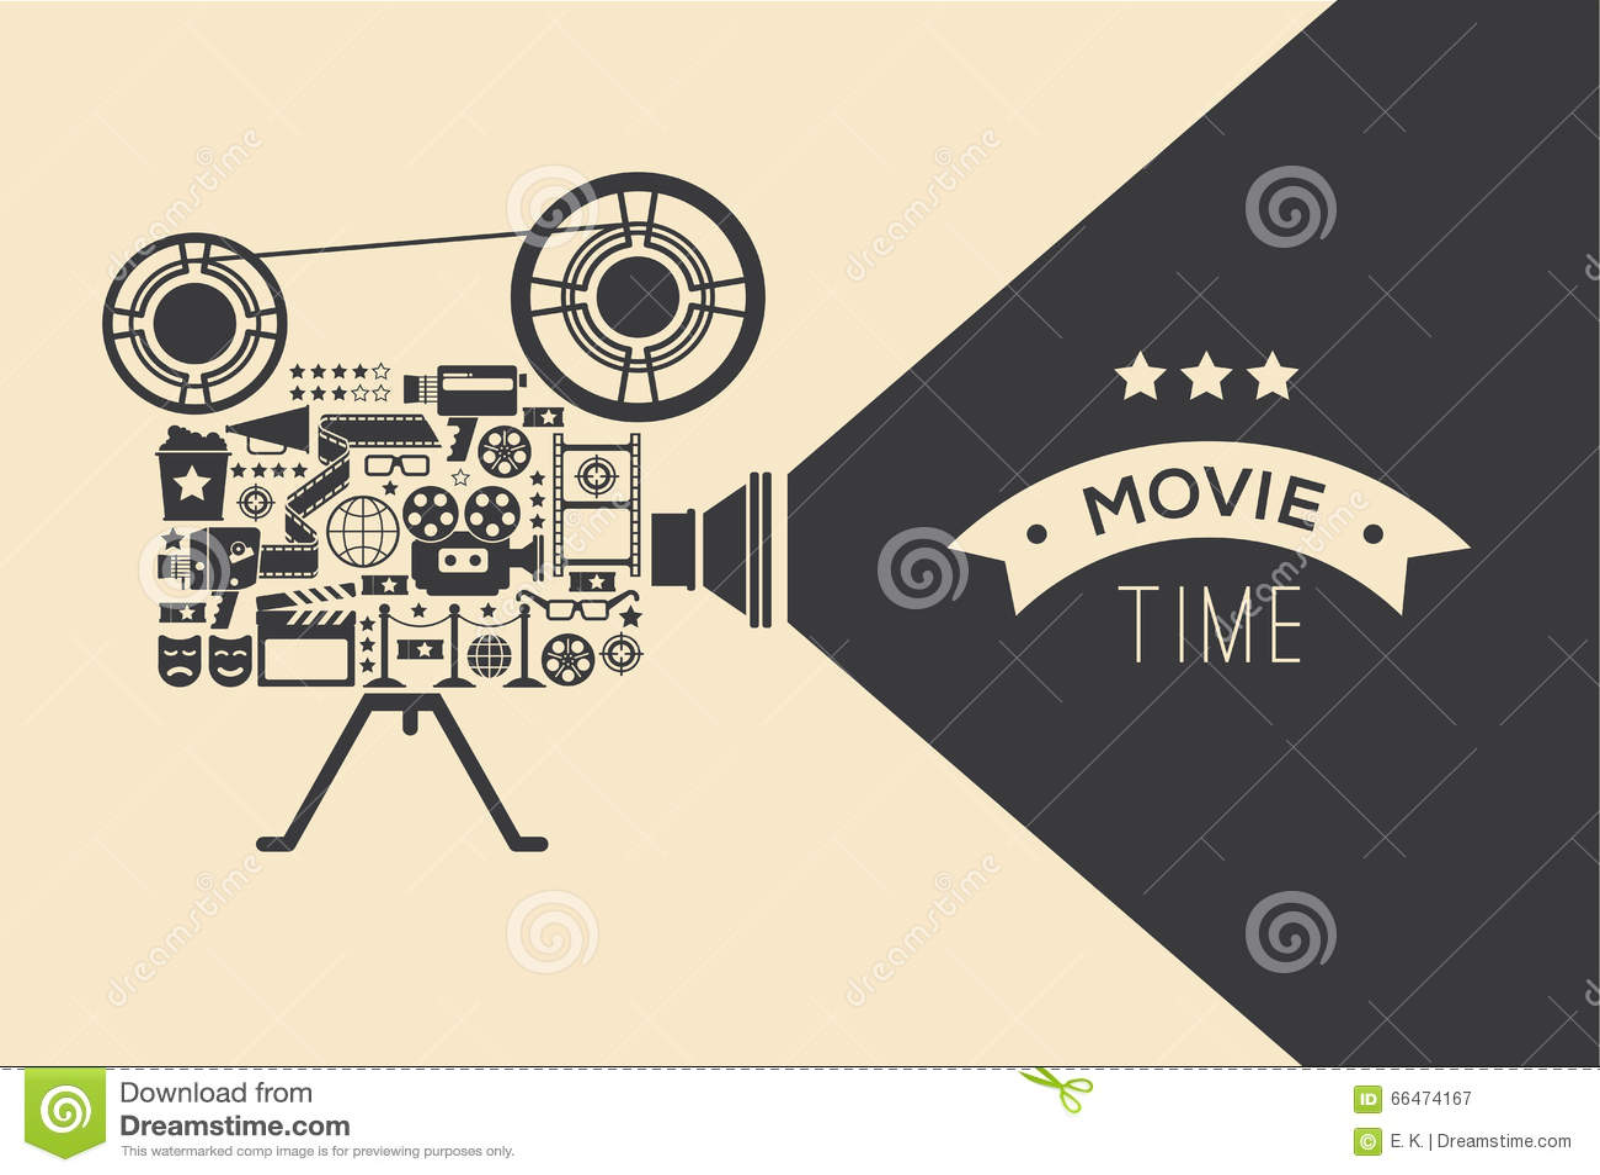 Decorative cinema template.